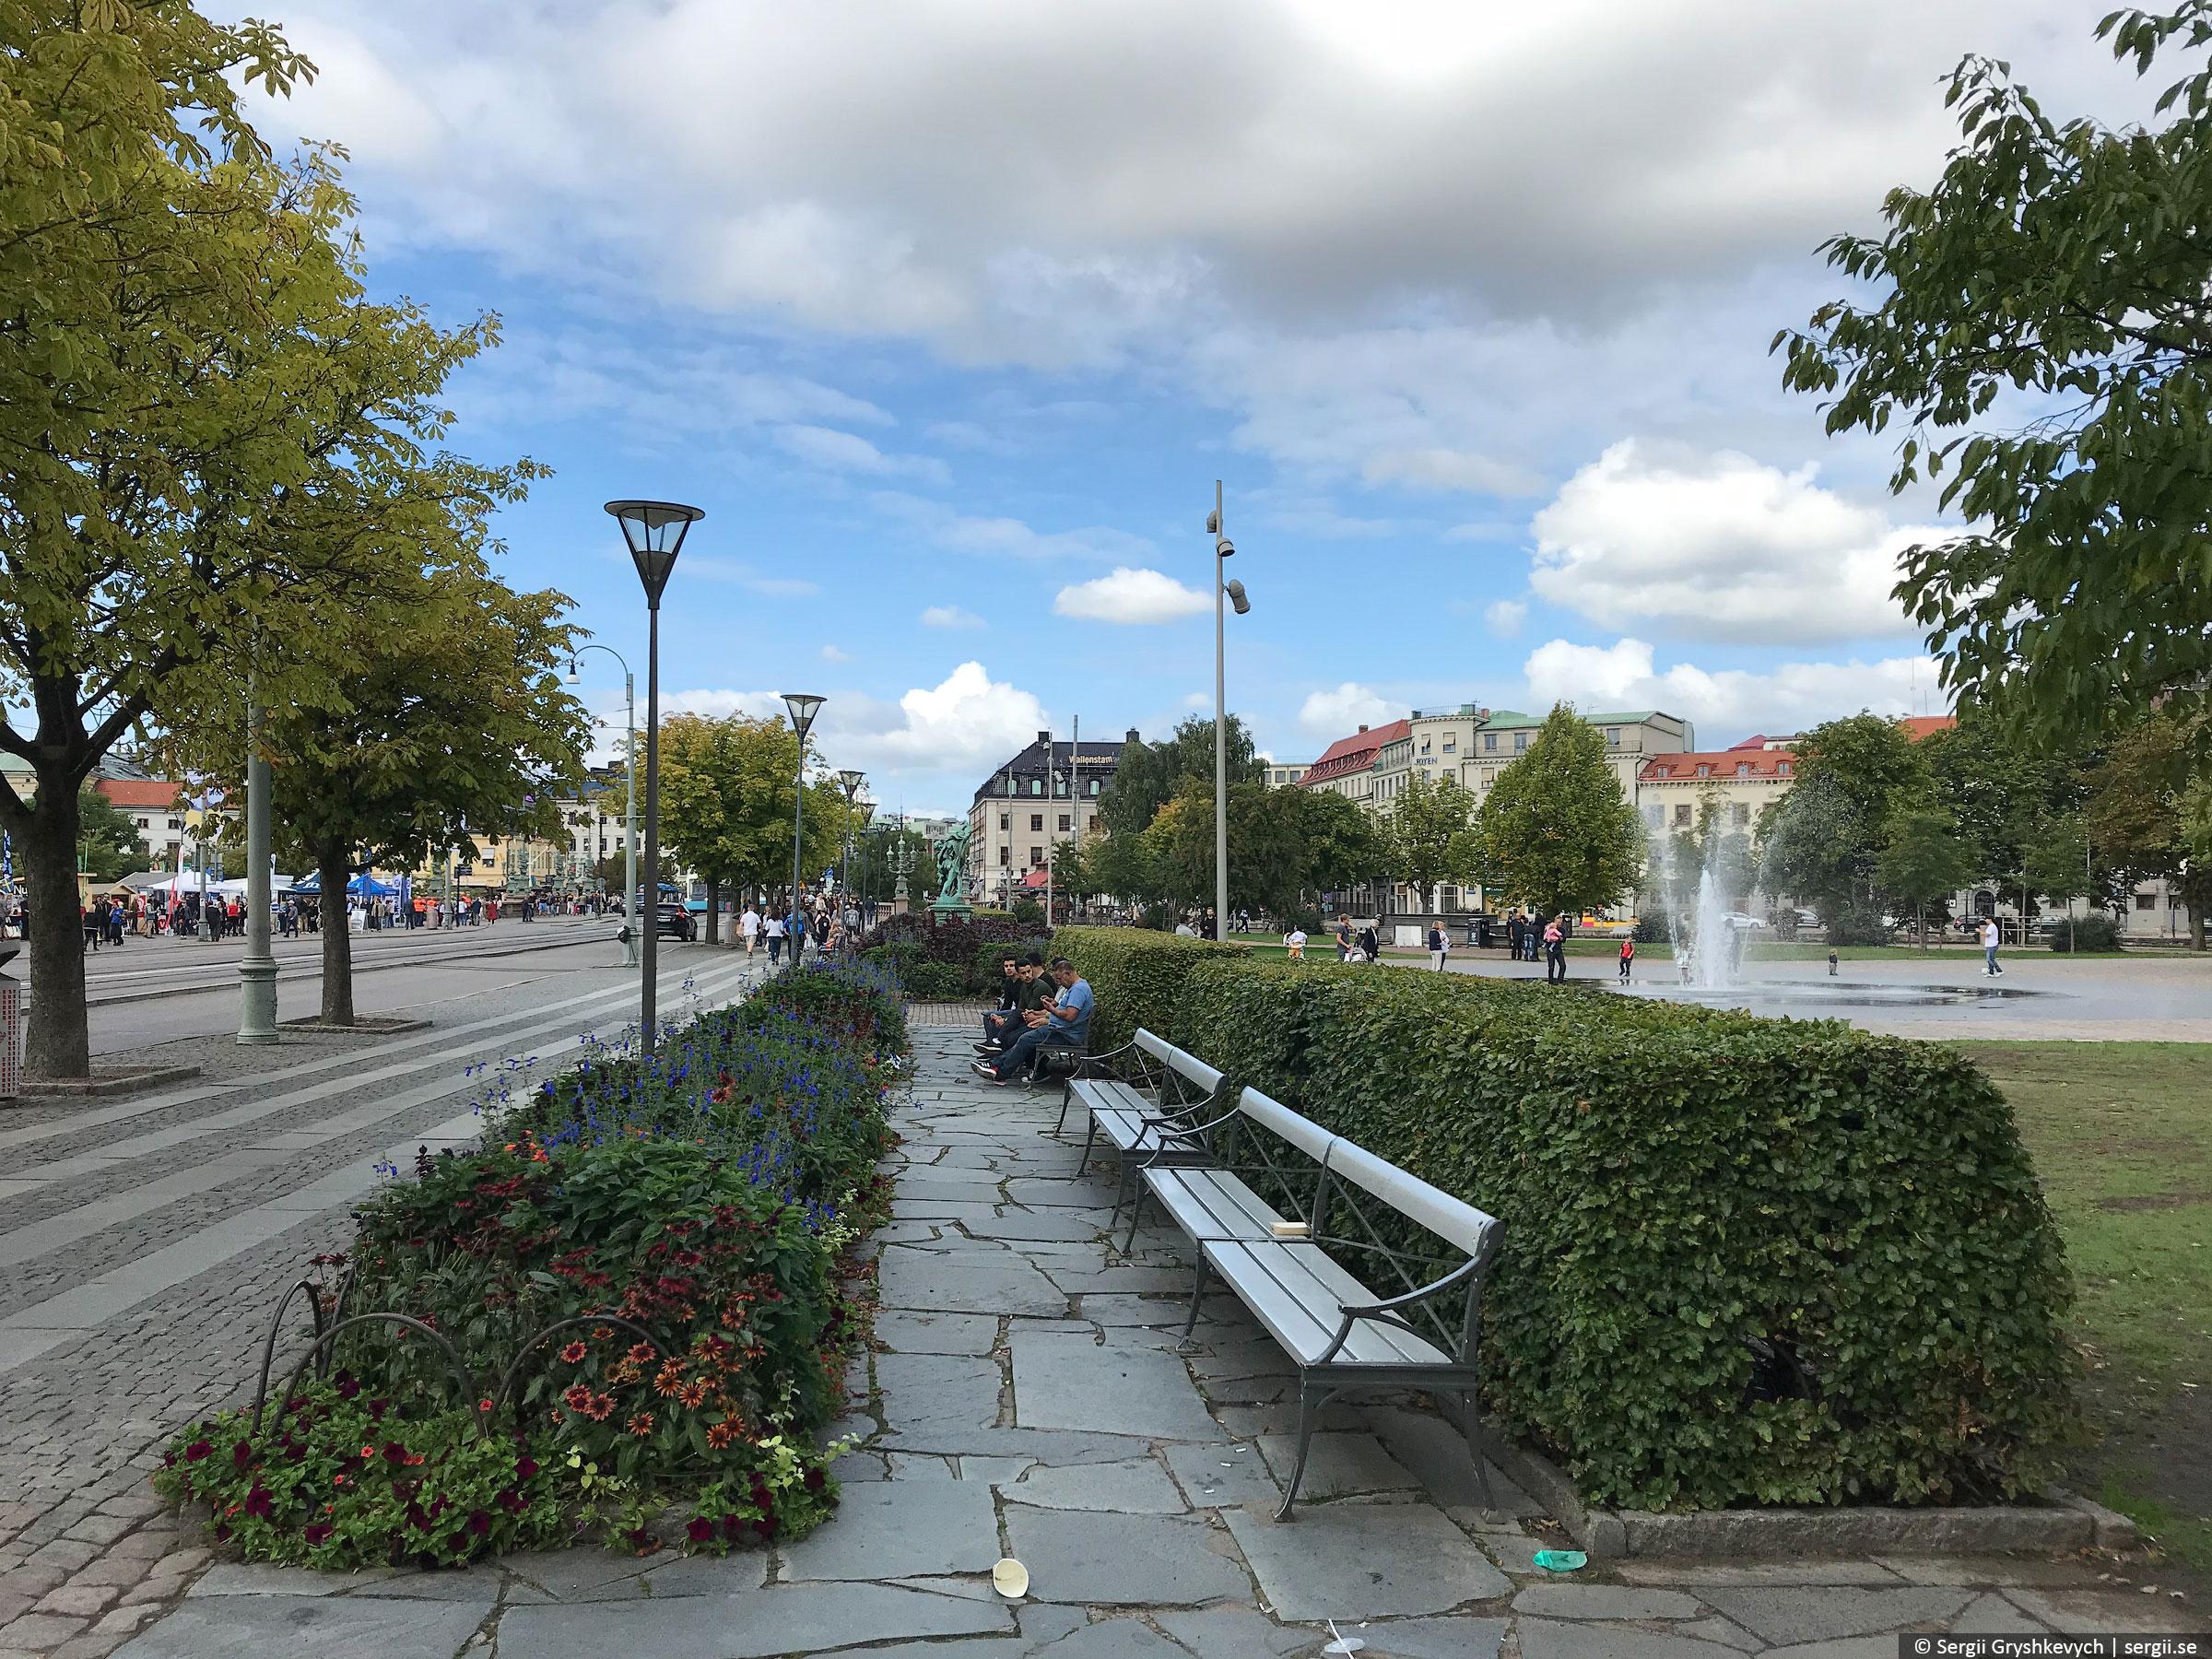 göteborg-ghotenburg-sweden-2018-51